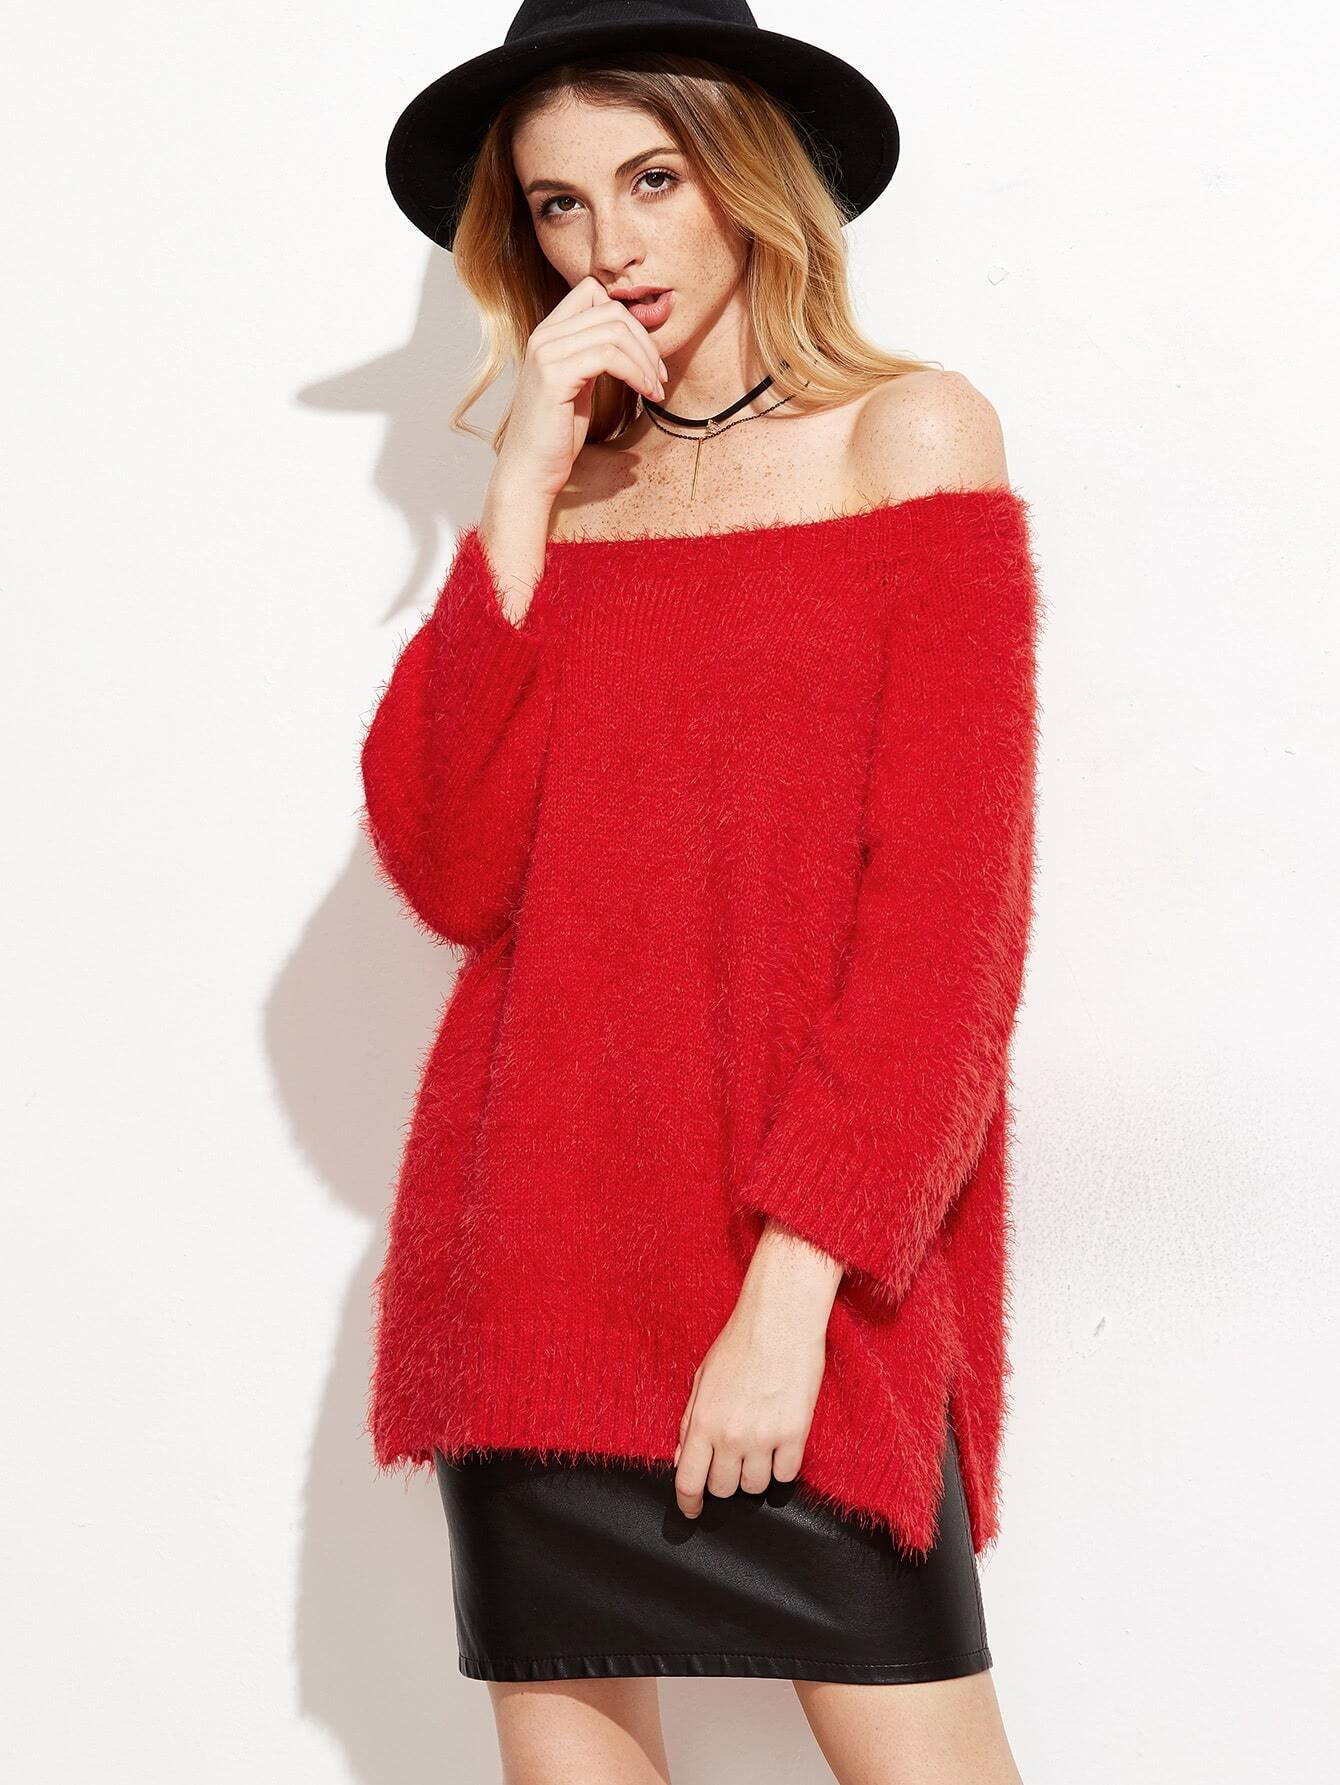 Red Off The Shoulder Slit Fluffy Sweater -SheIn(Sheinside)